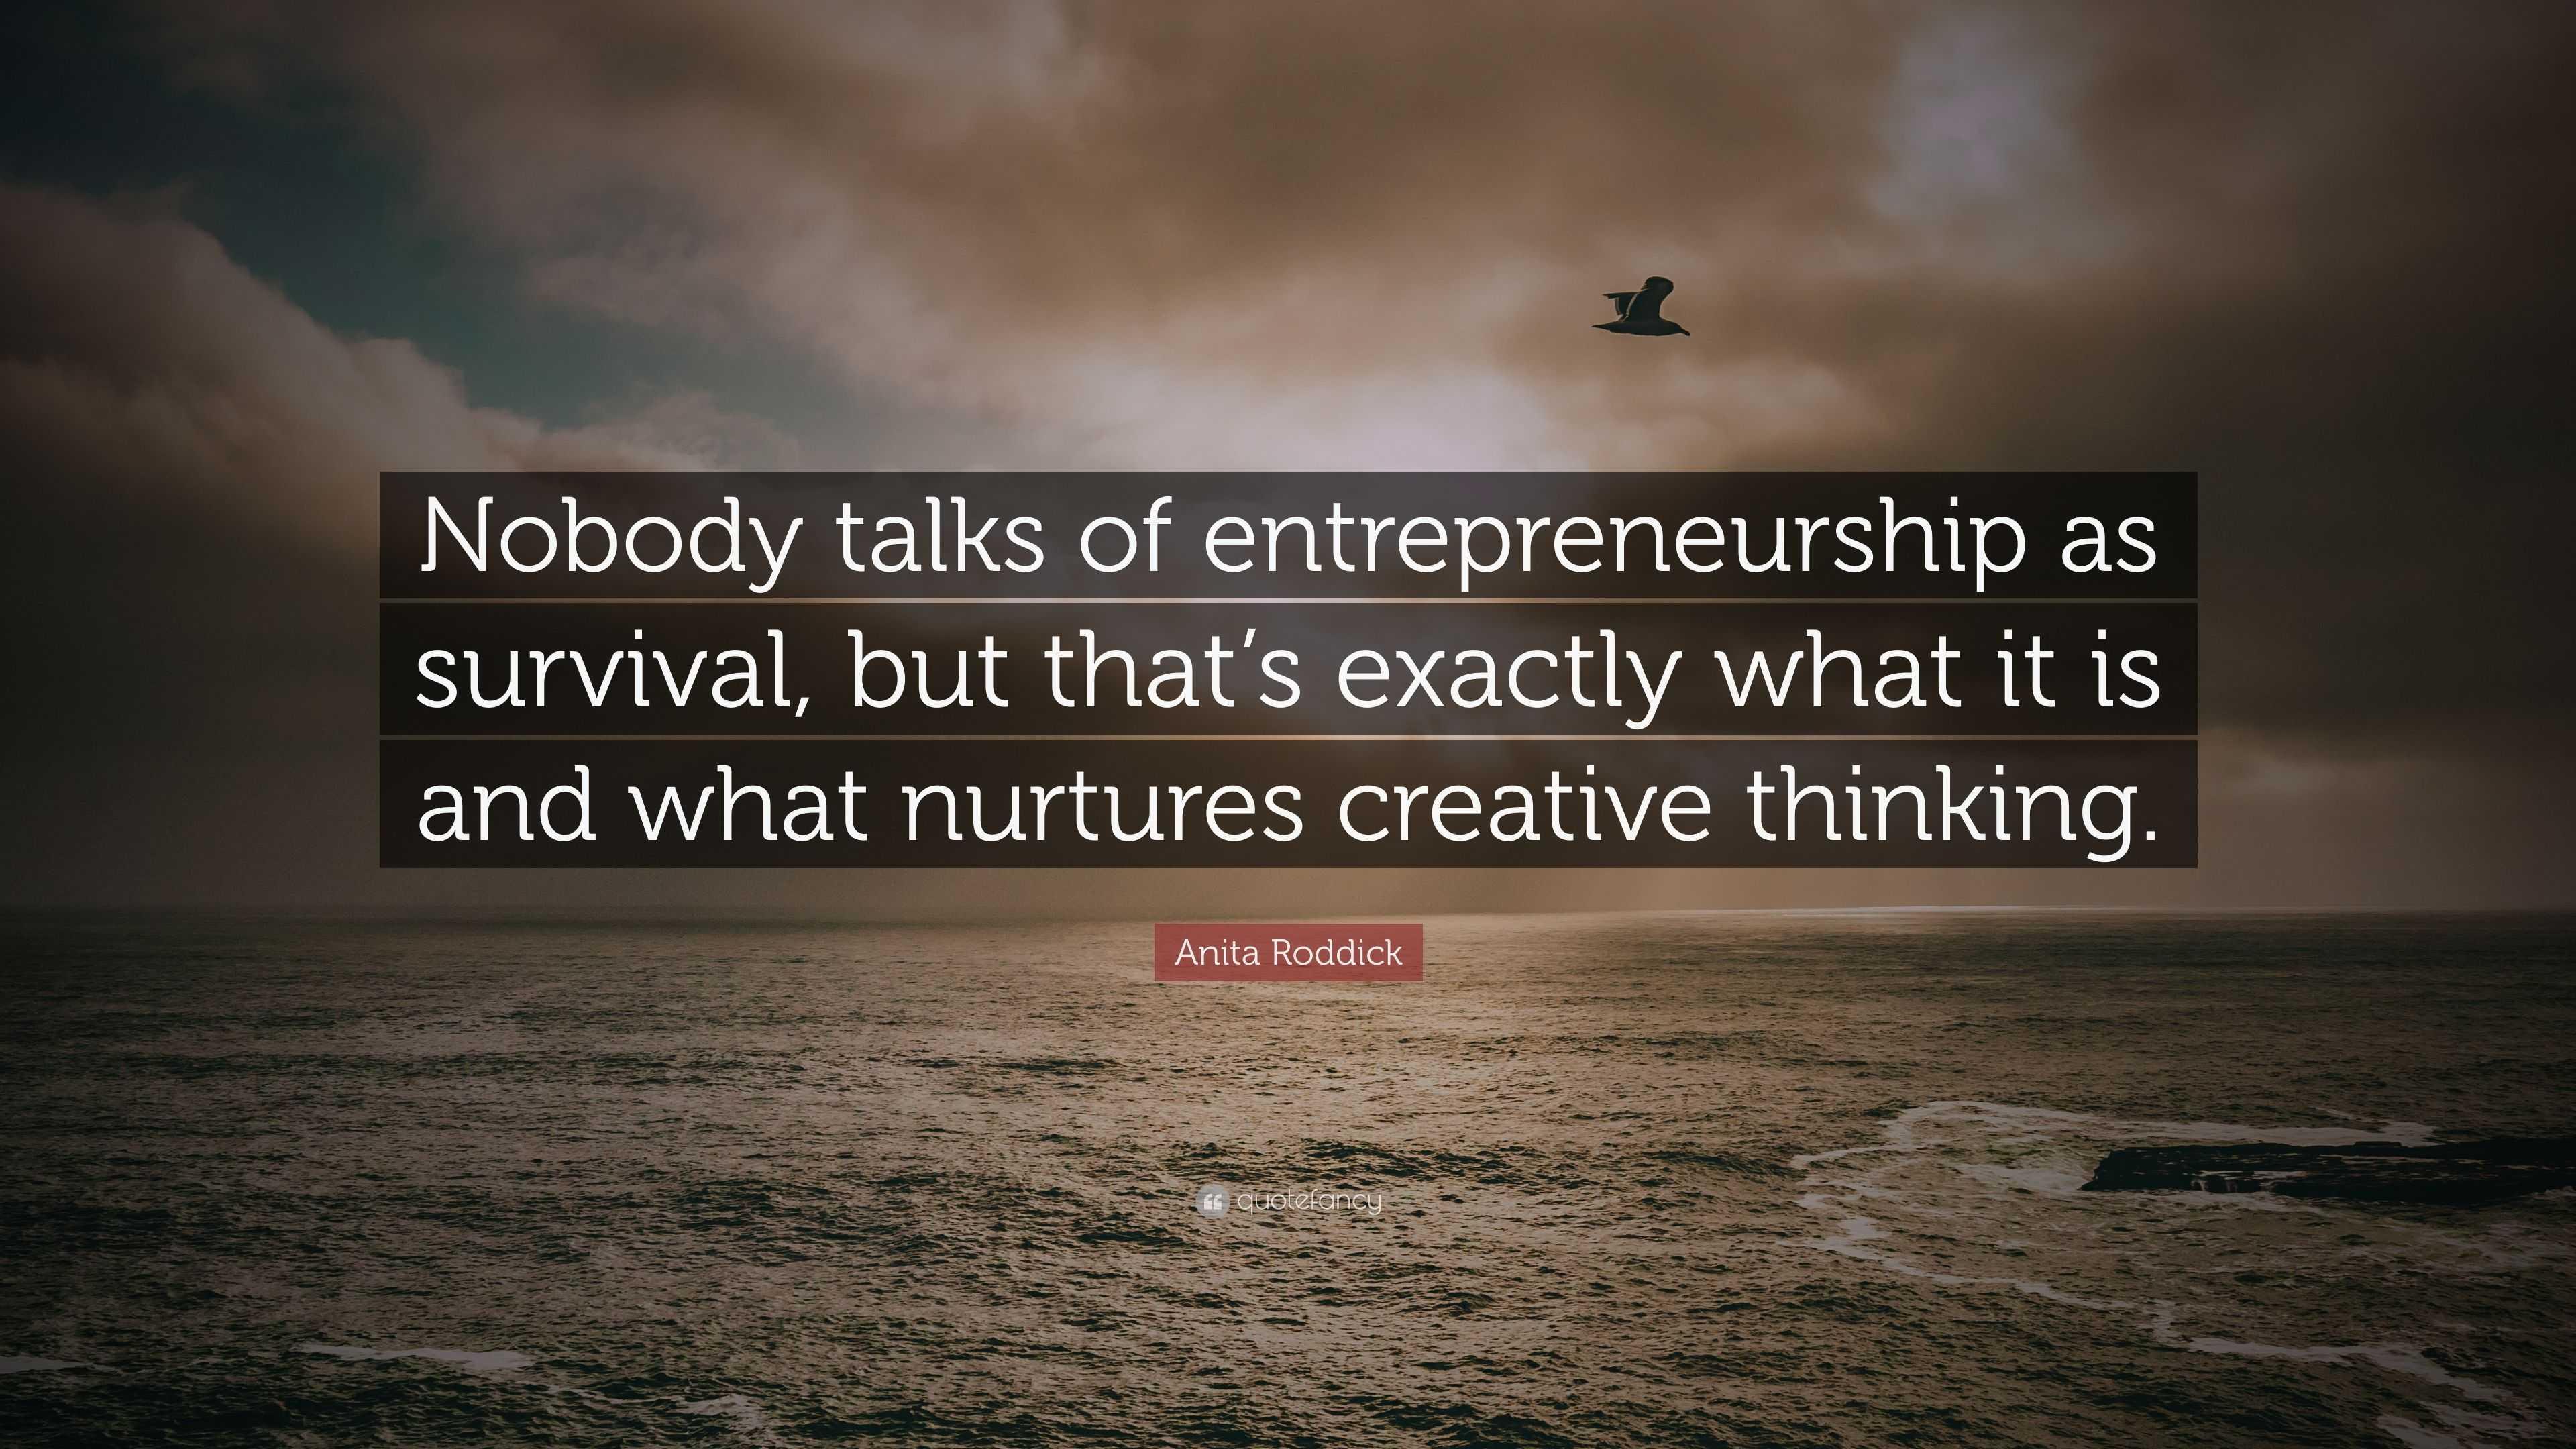 anita roddick entrepreneur